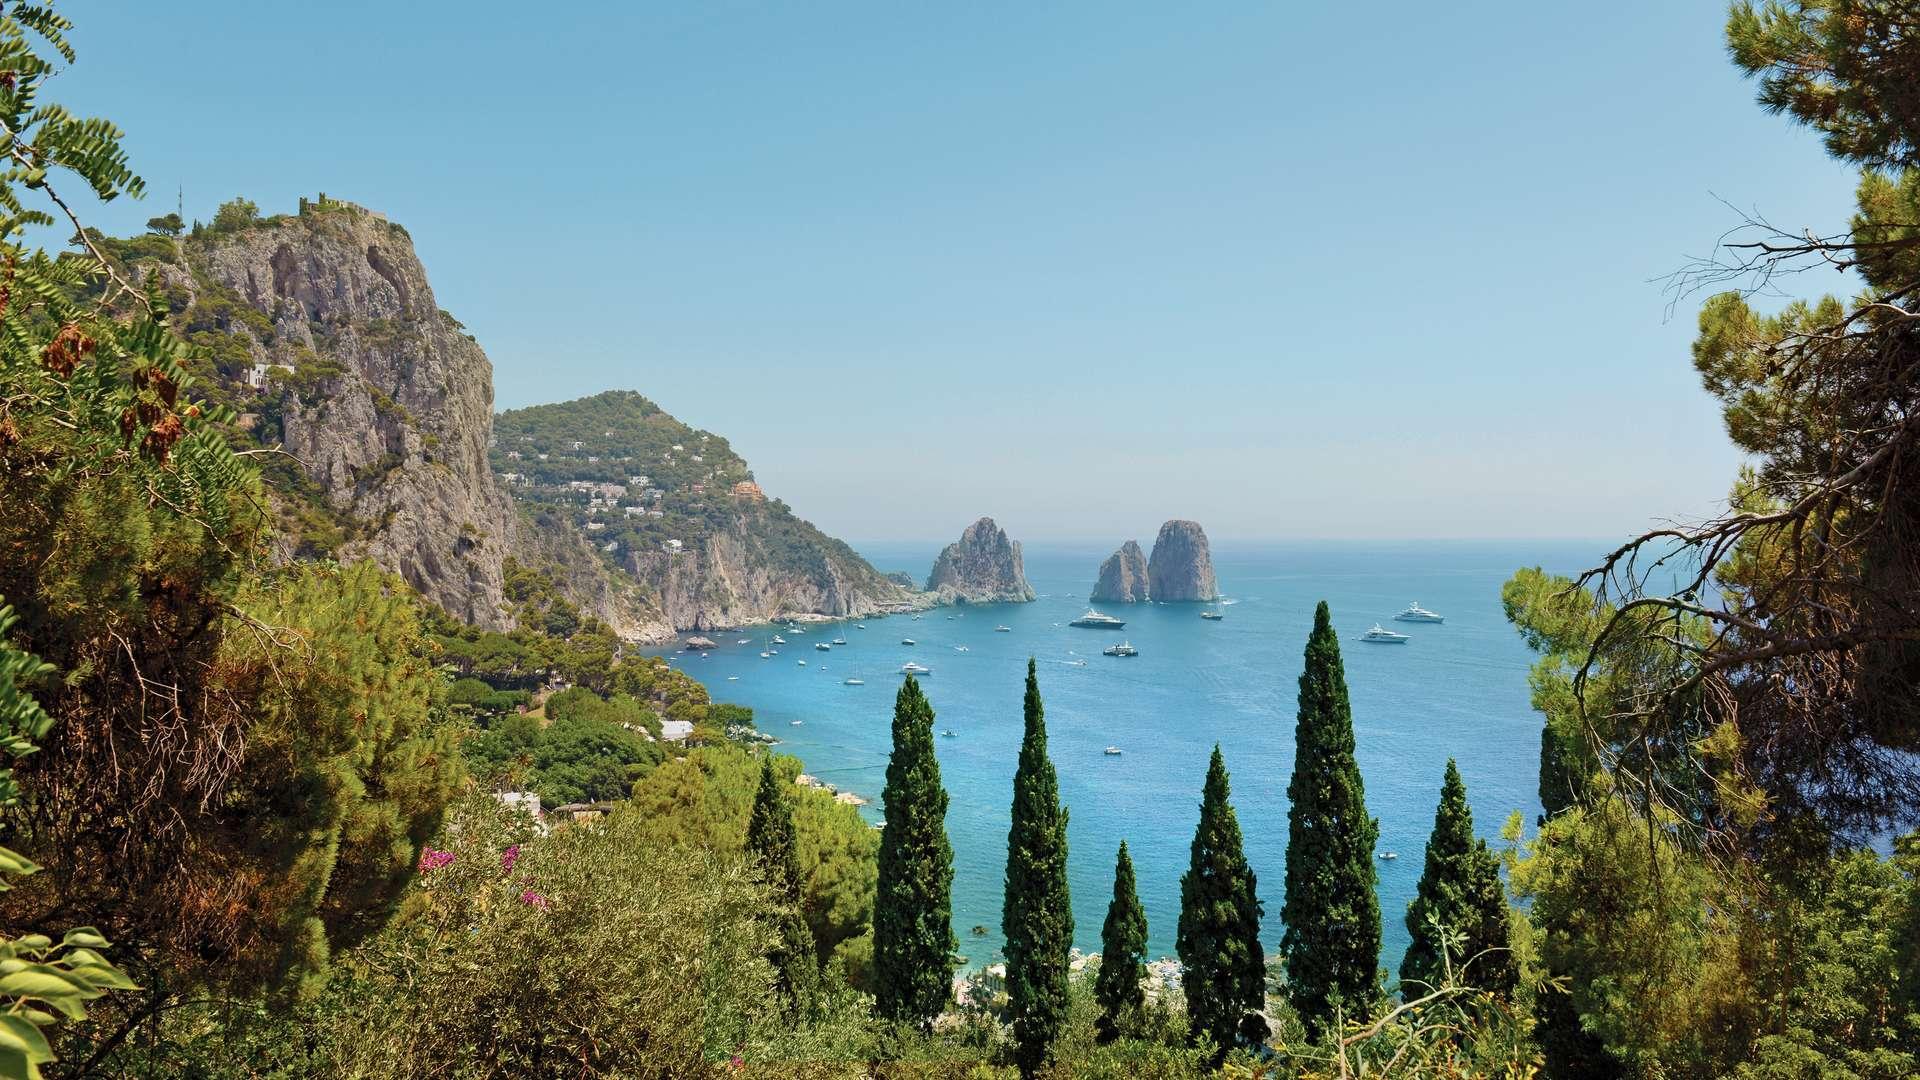 Capri & Ischia Resorts & Hotels 2021/2022 | The Best ...